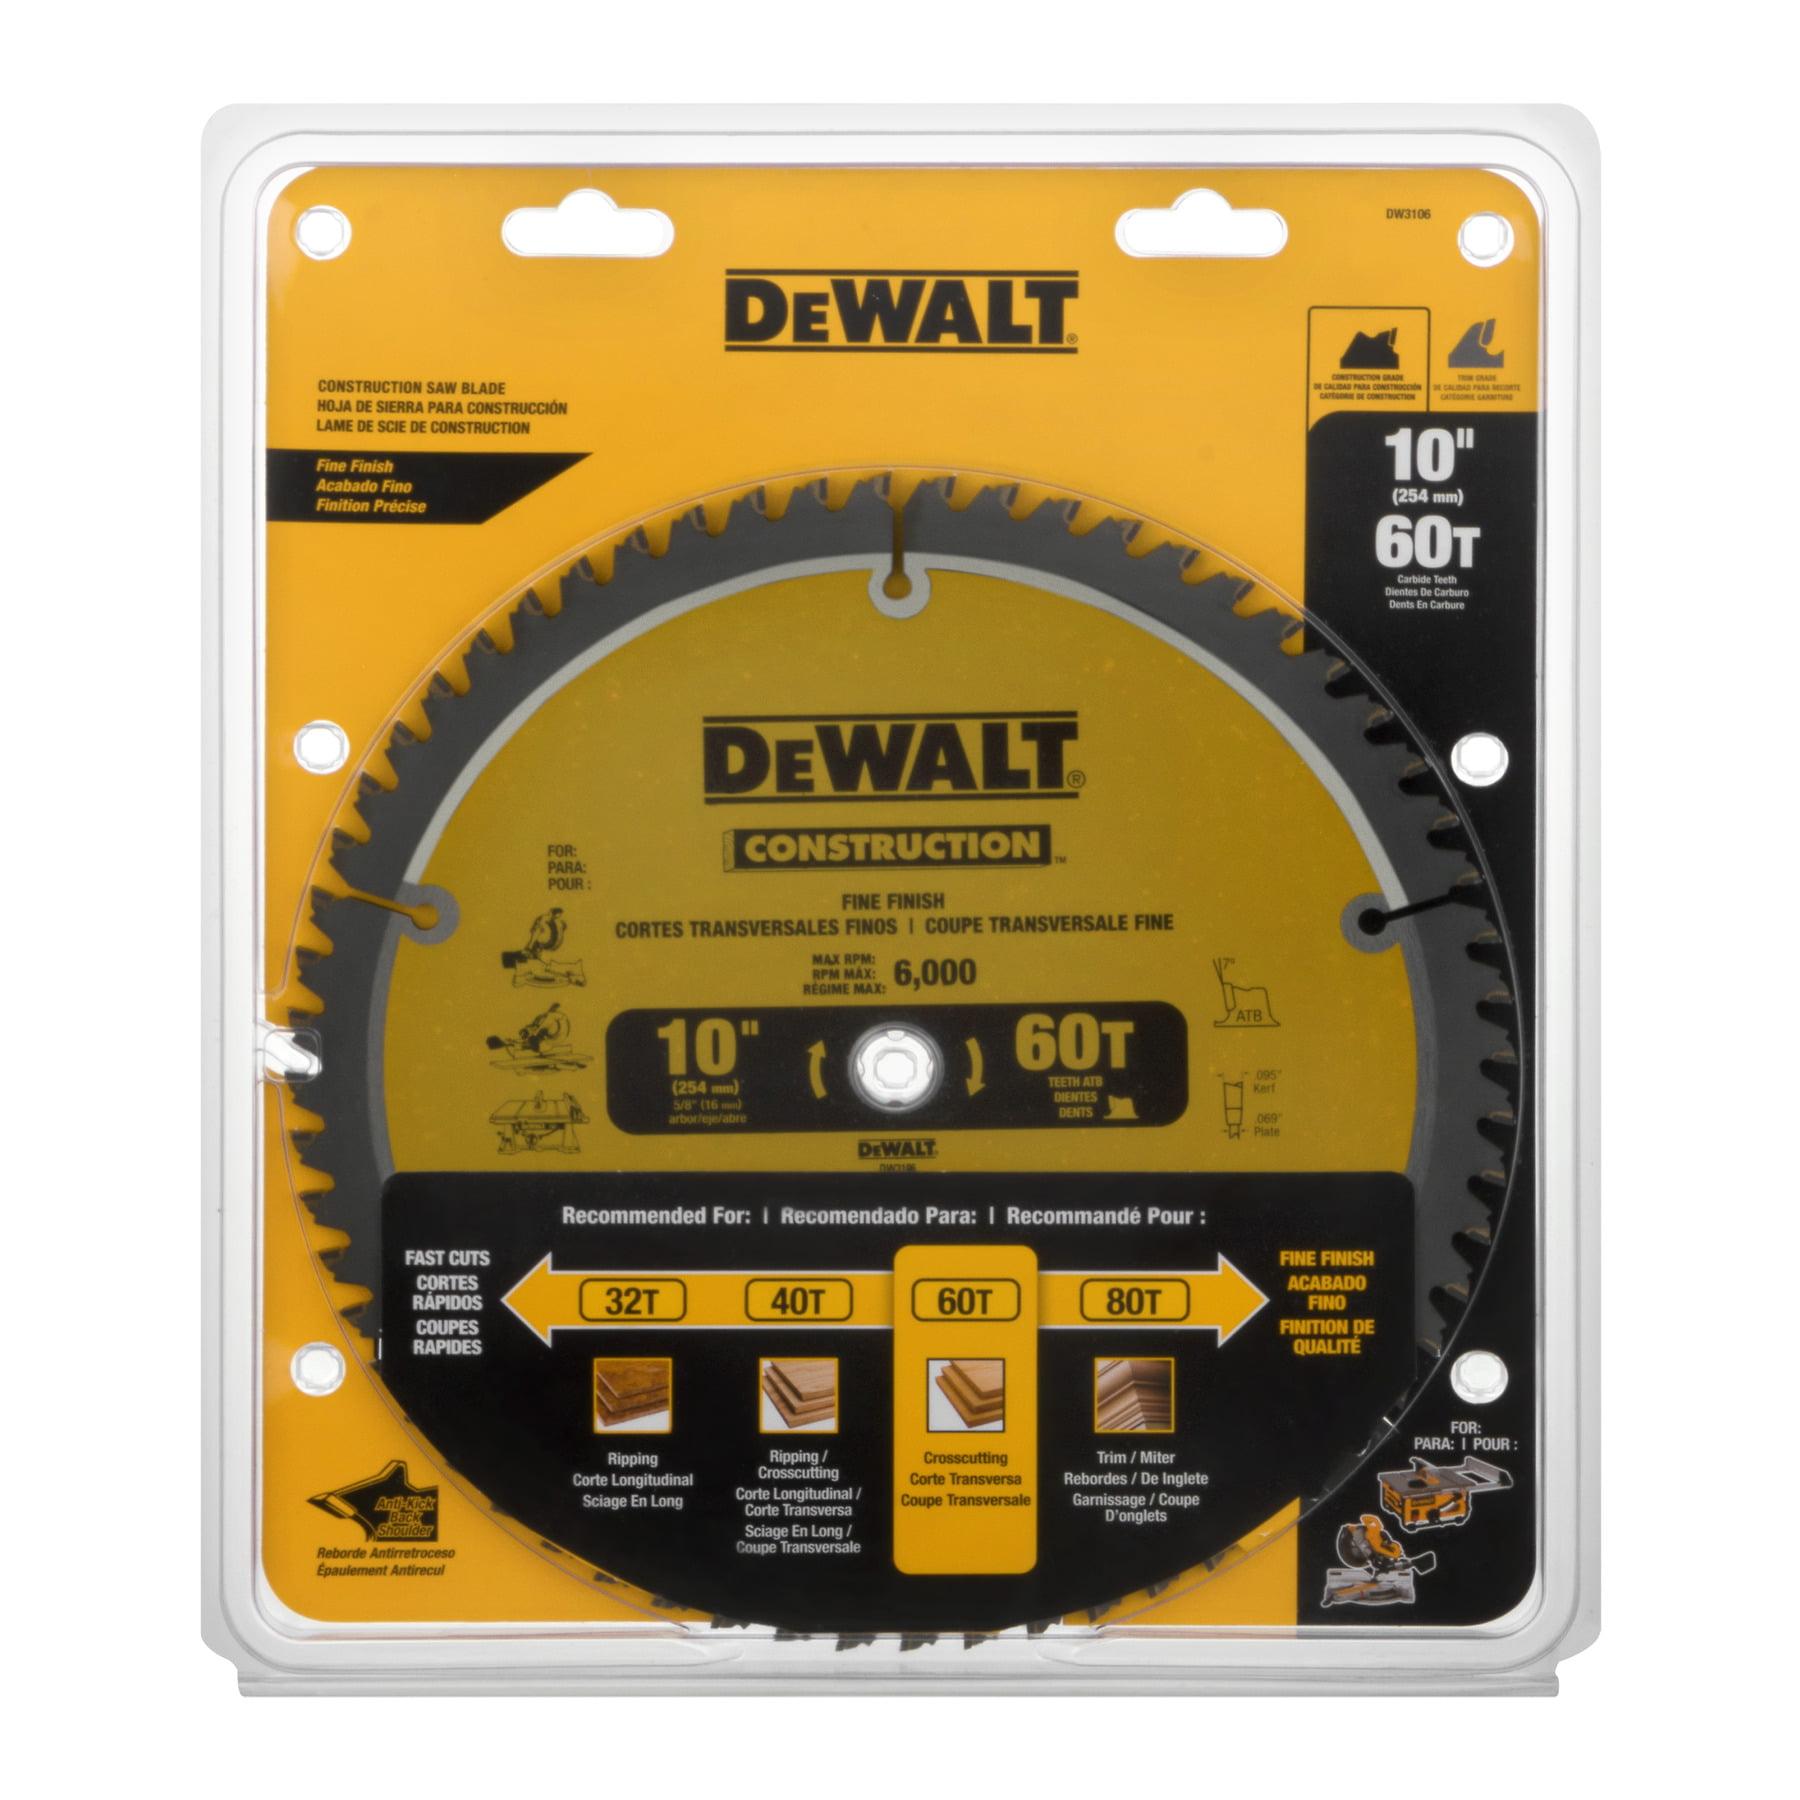 "DeWalt Construction Saw Blade 10"", 1.0 CT"